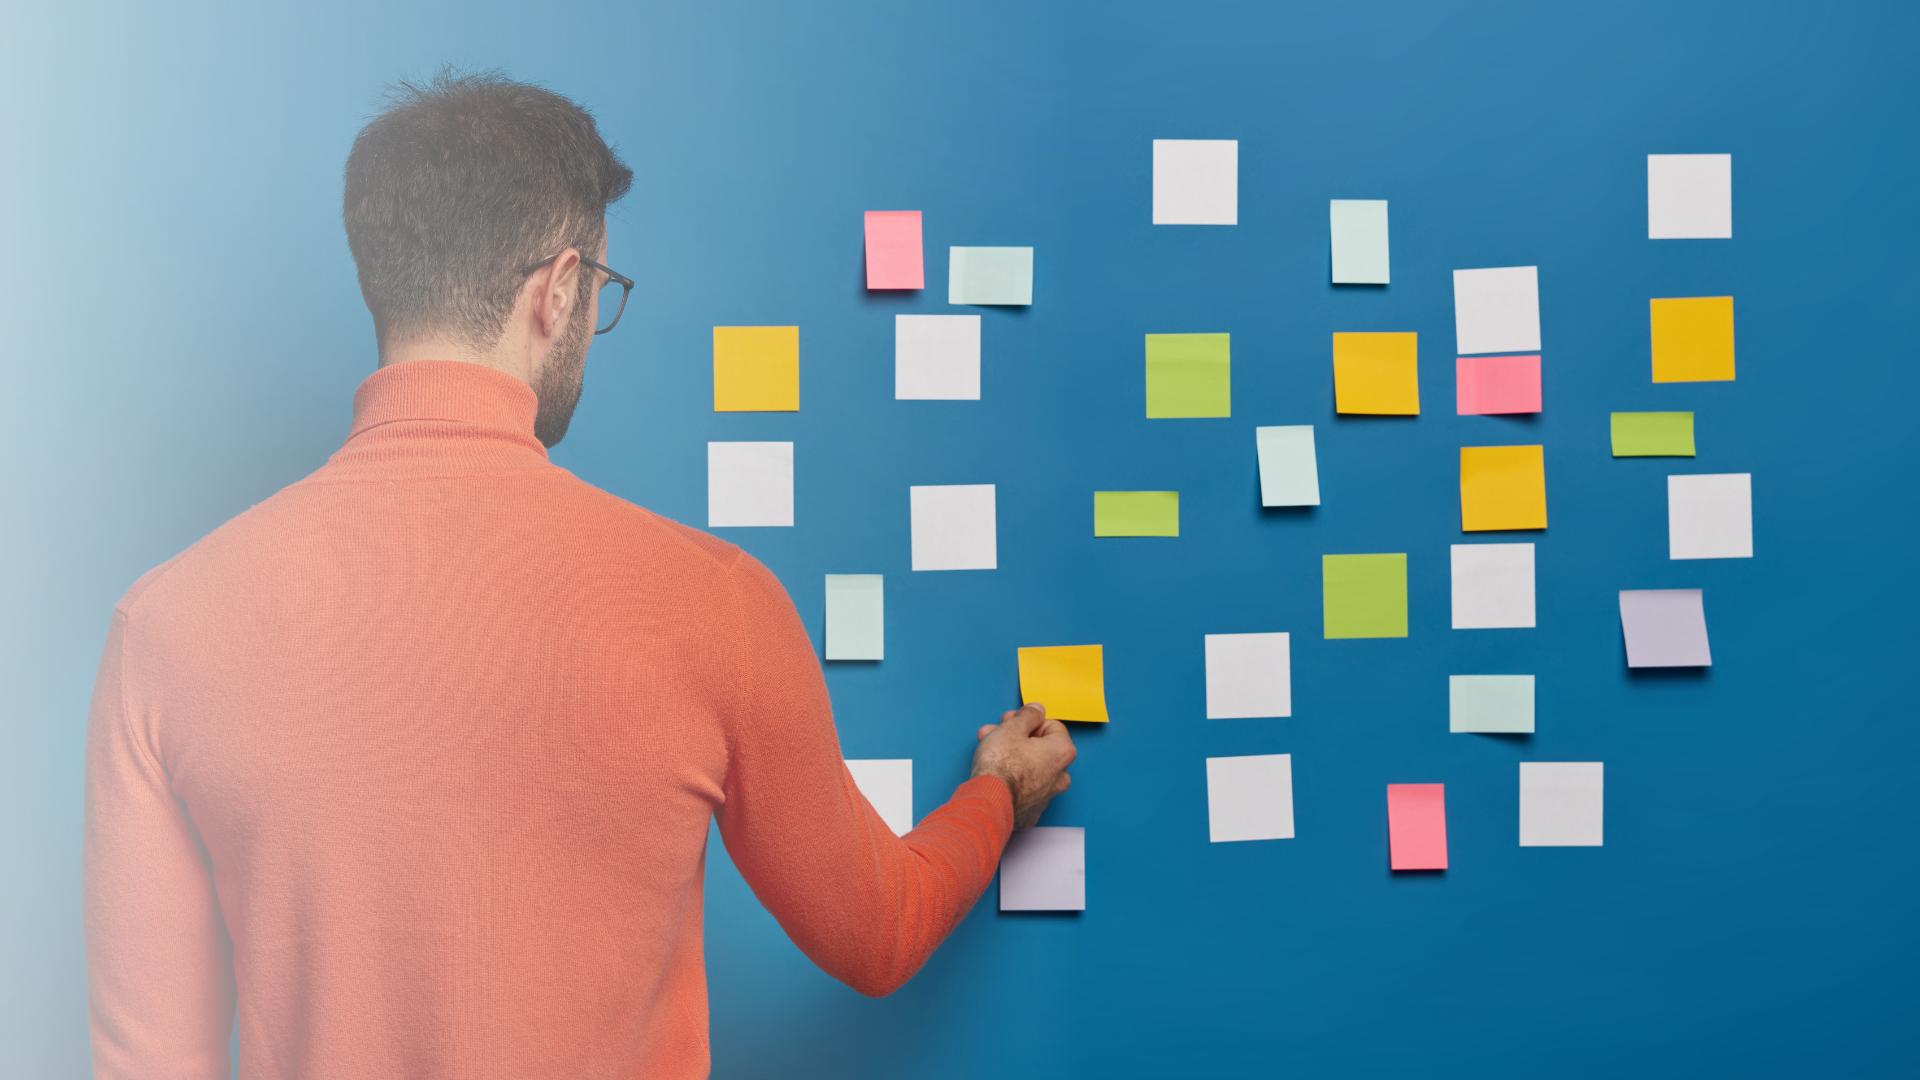 Infografía:Diseña un Plan de Formación altamente efectivo en 7 pasos